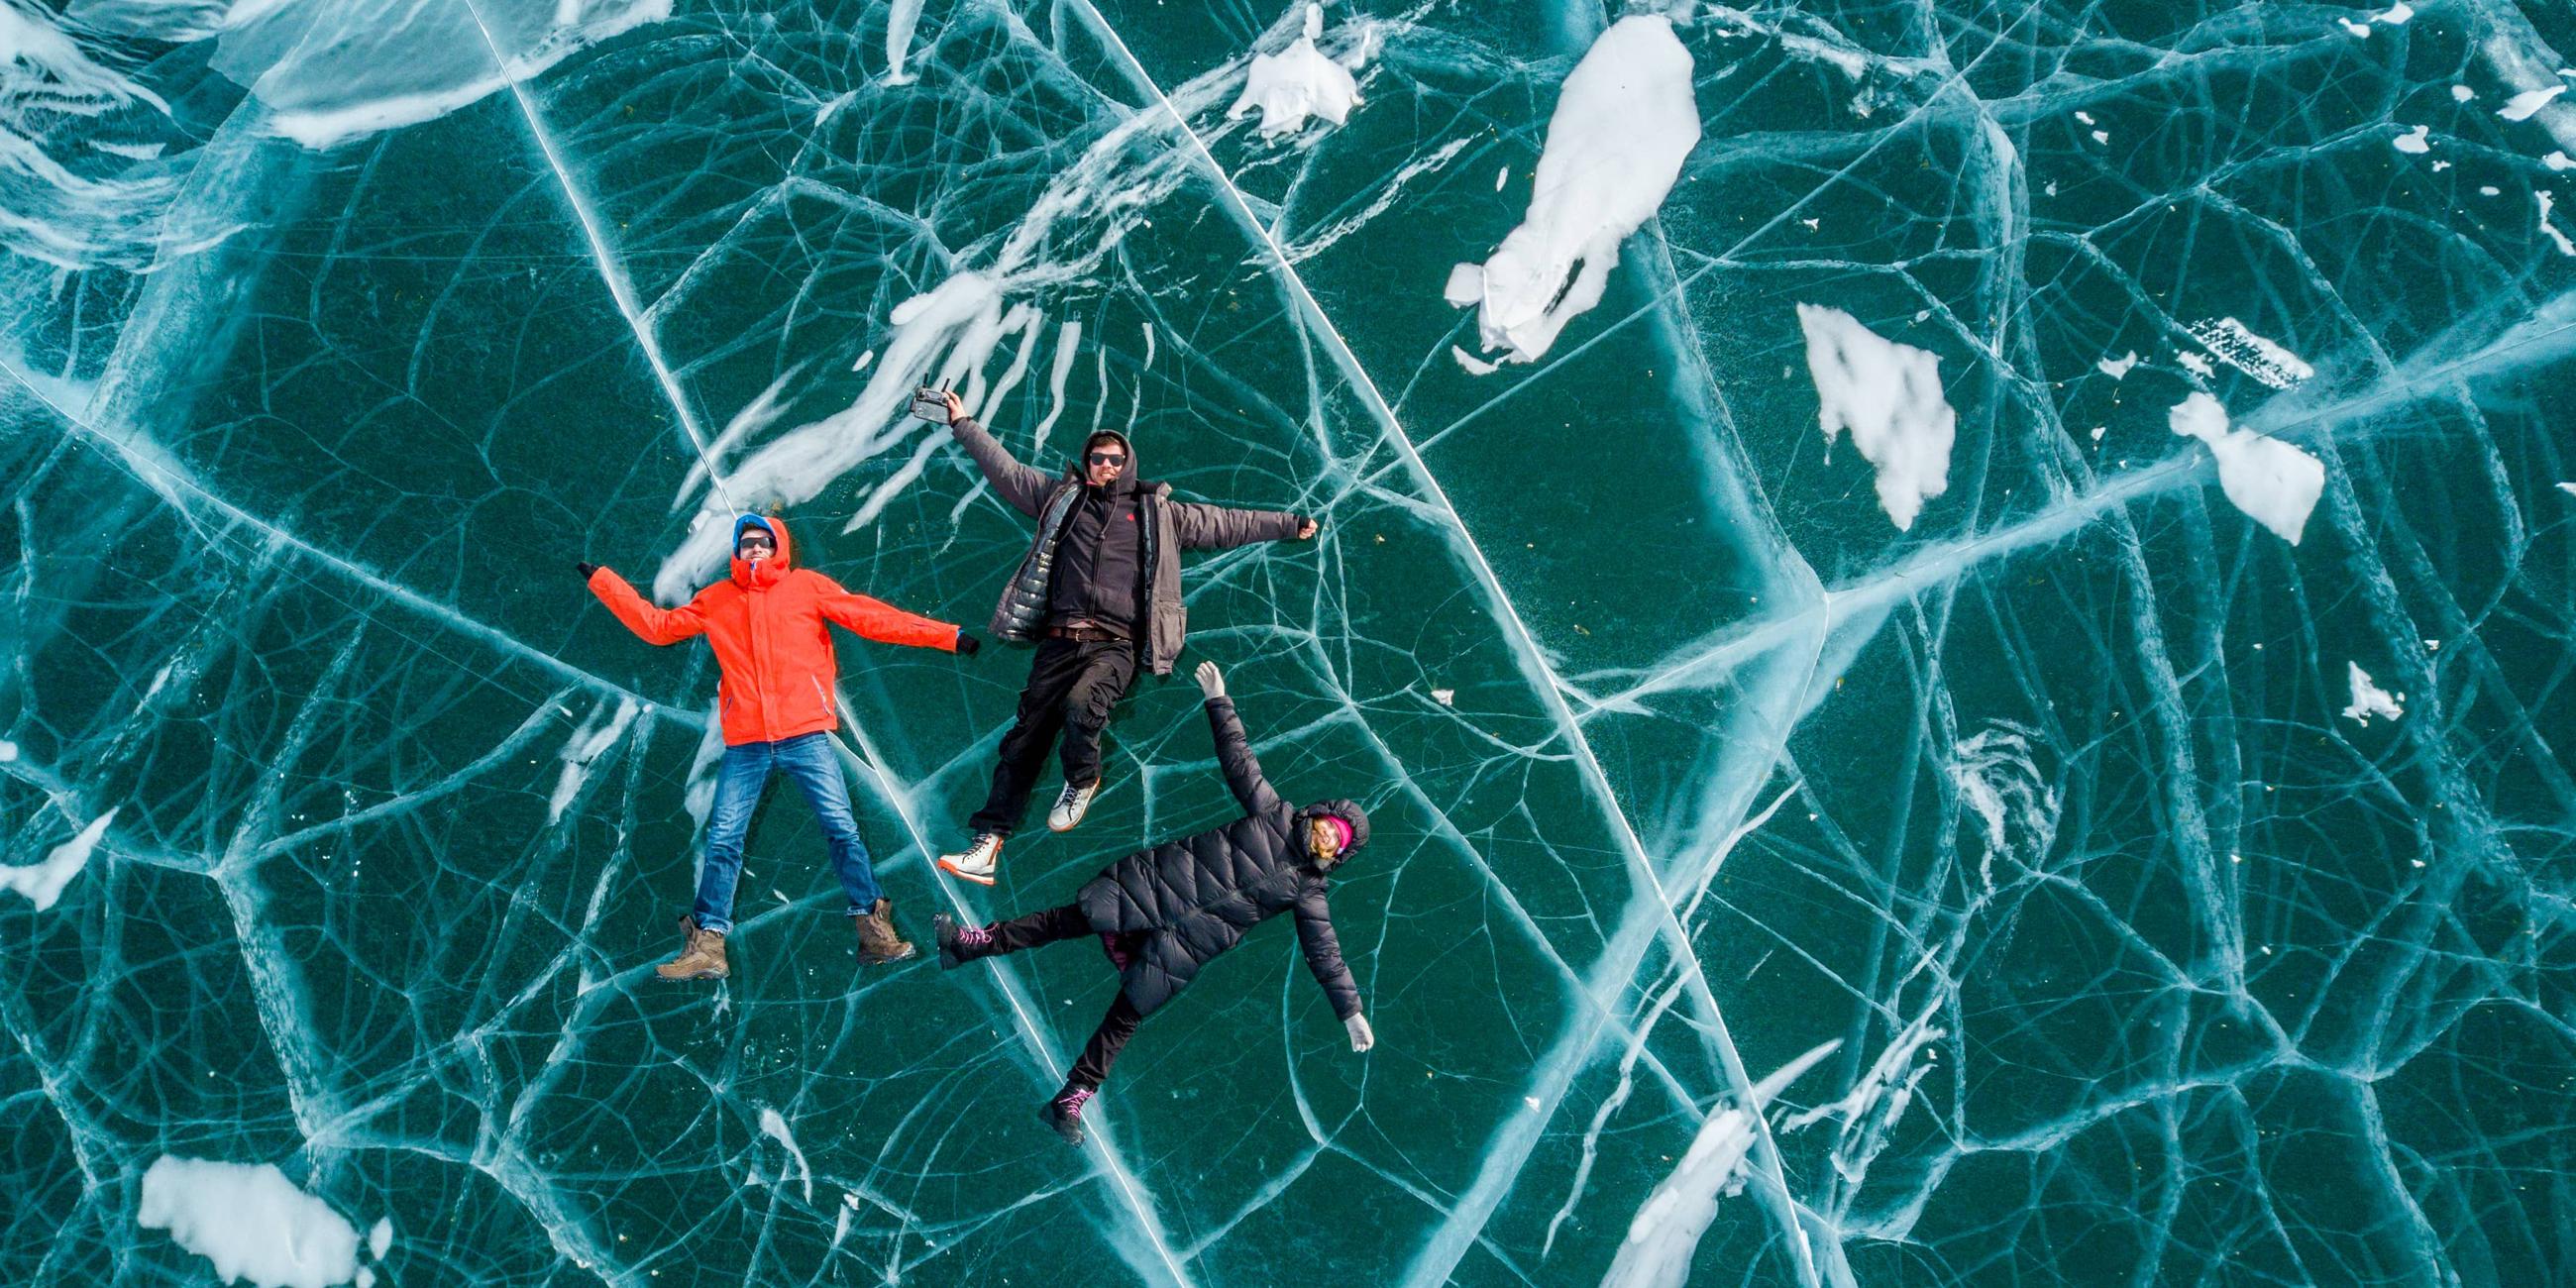 Зимой чистый лед Байкала похож на мраморФото: Виктор Гусейнов